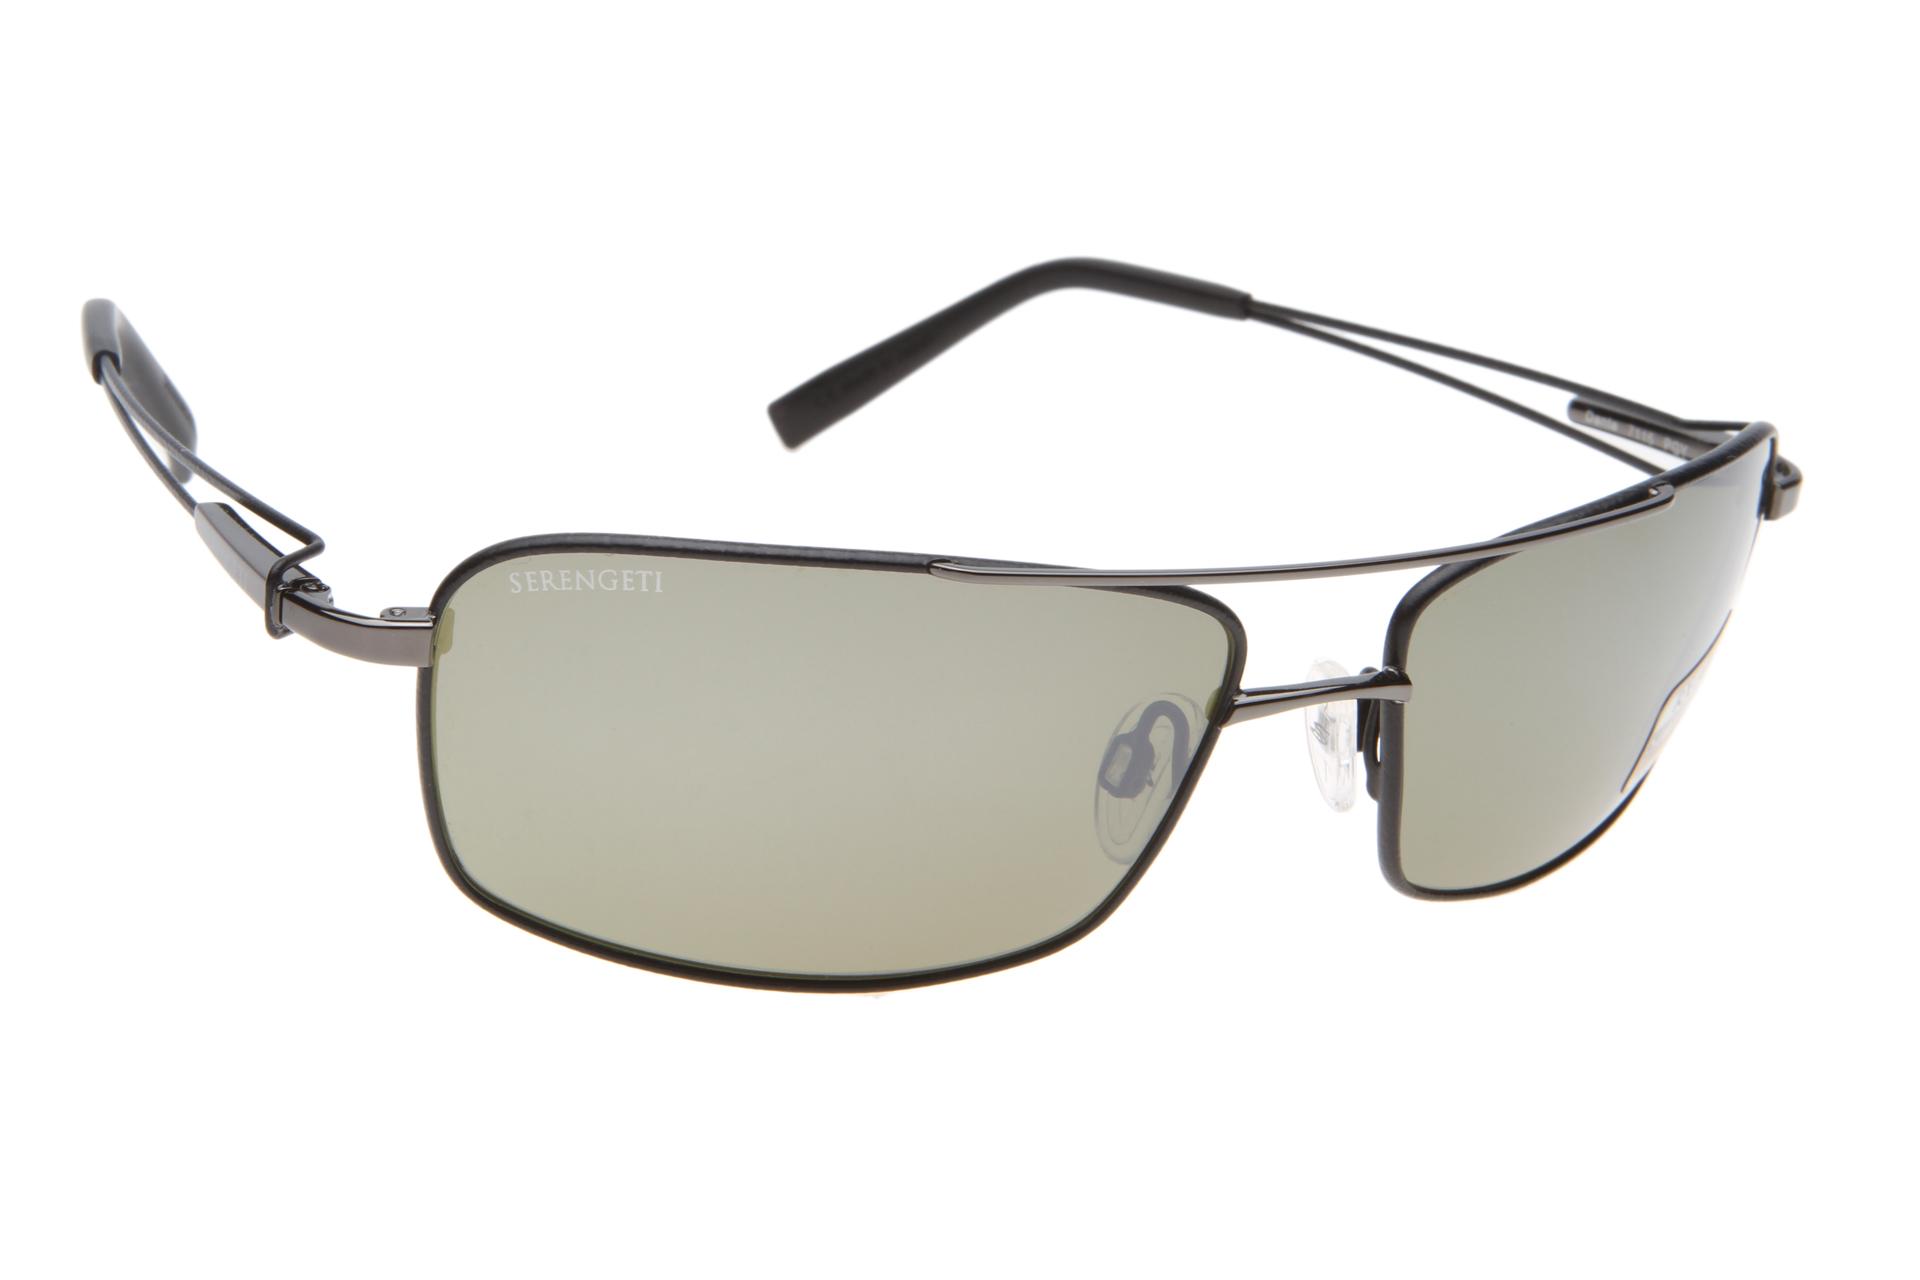 ceb71693ce Serengeti Dante 7115 (Shiny Gunmetal Black Tannery) Gepolari zonnebril